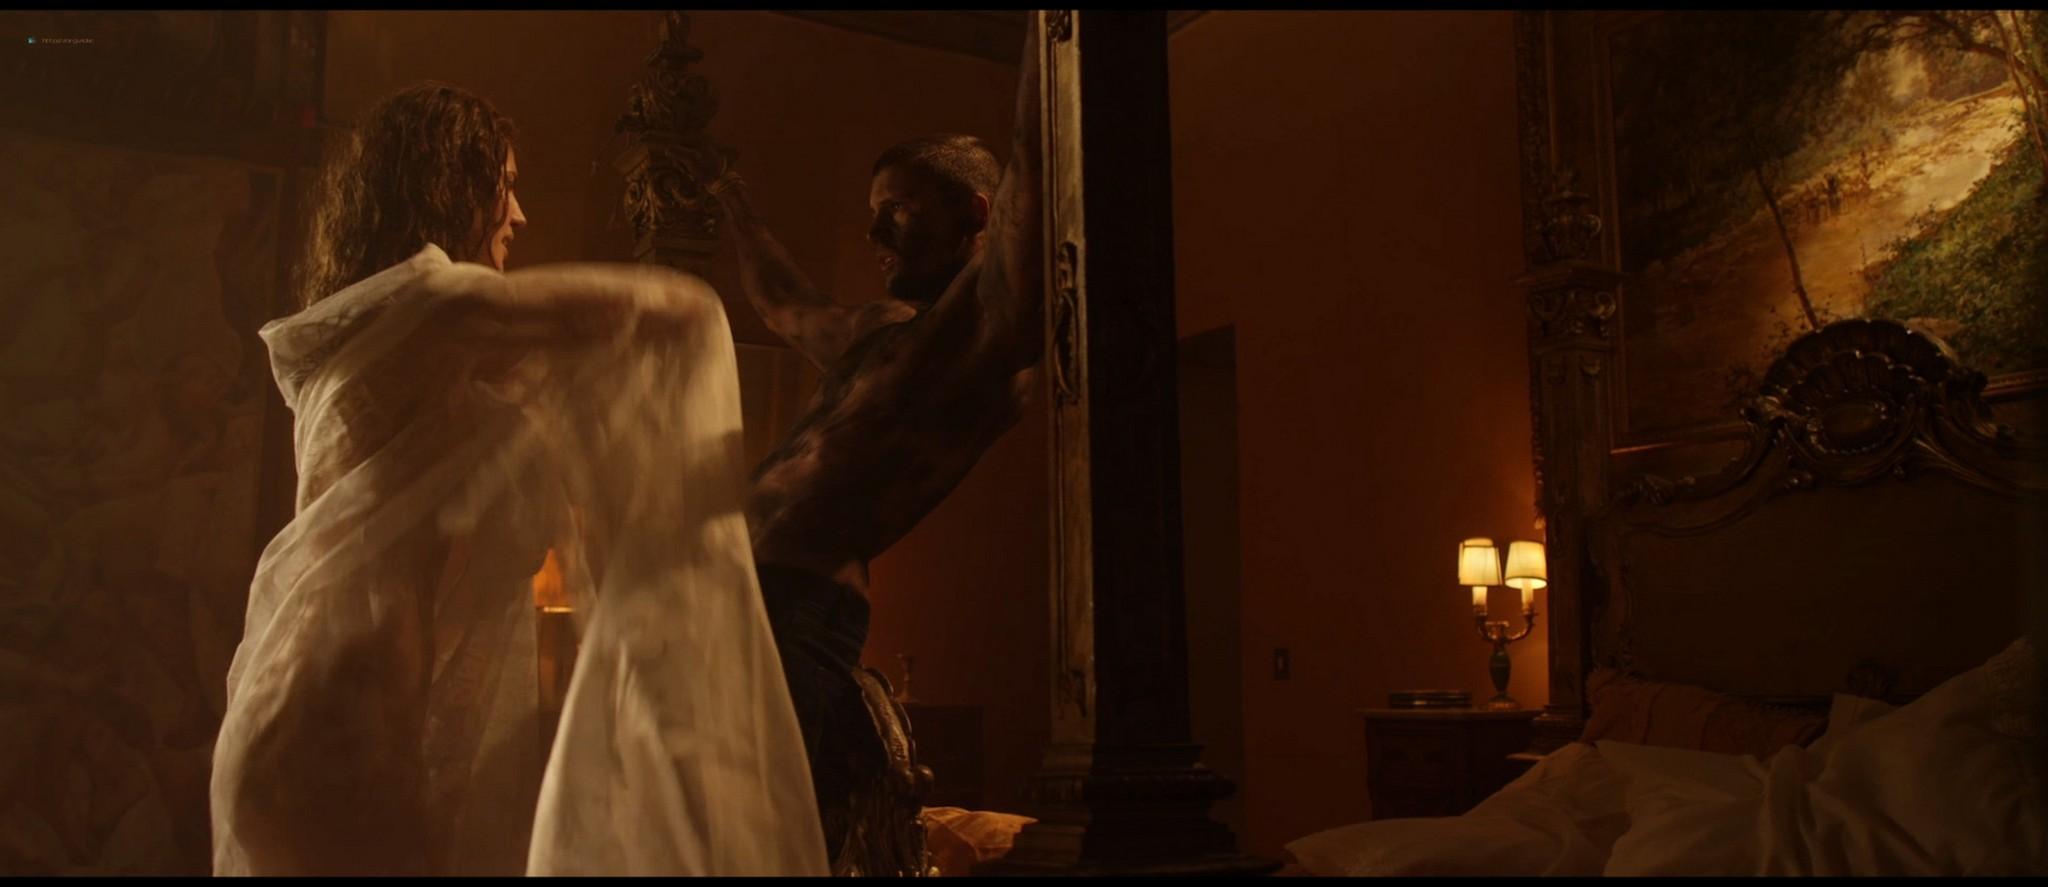 Elena Mirela nude Grazia Leone, Denny Méndez nude too - Blood Trap (2016) HD 1080p BluRay (8)